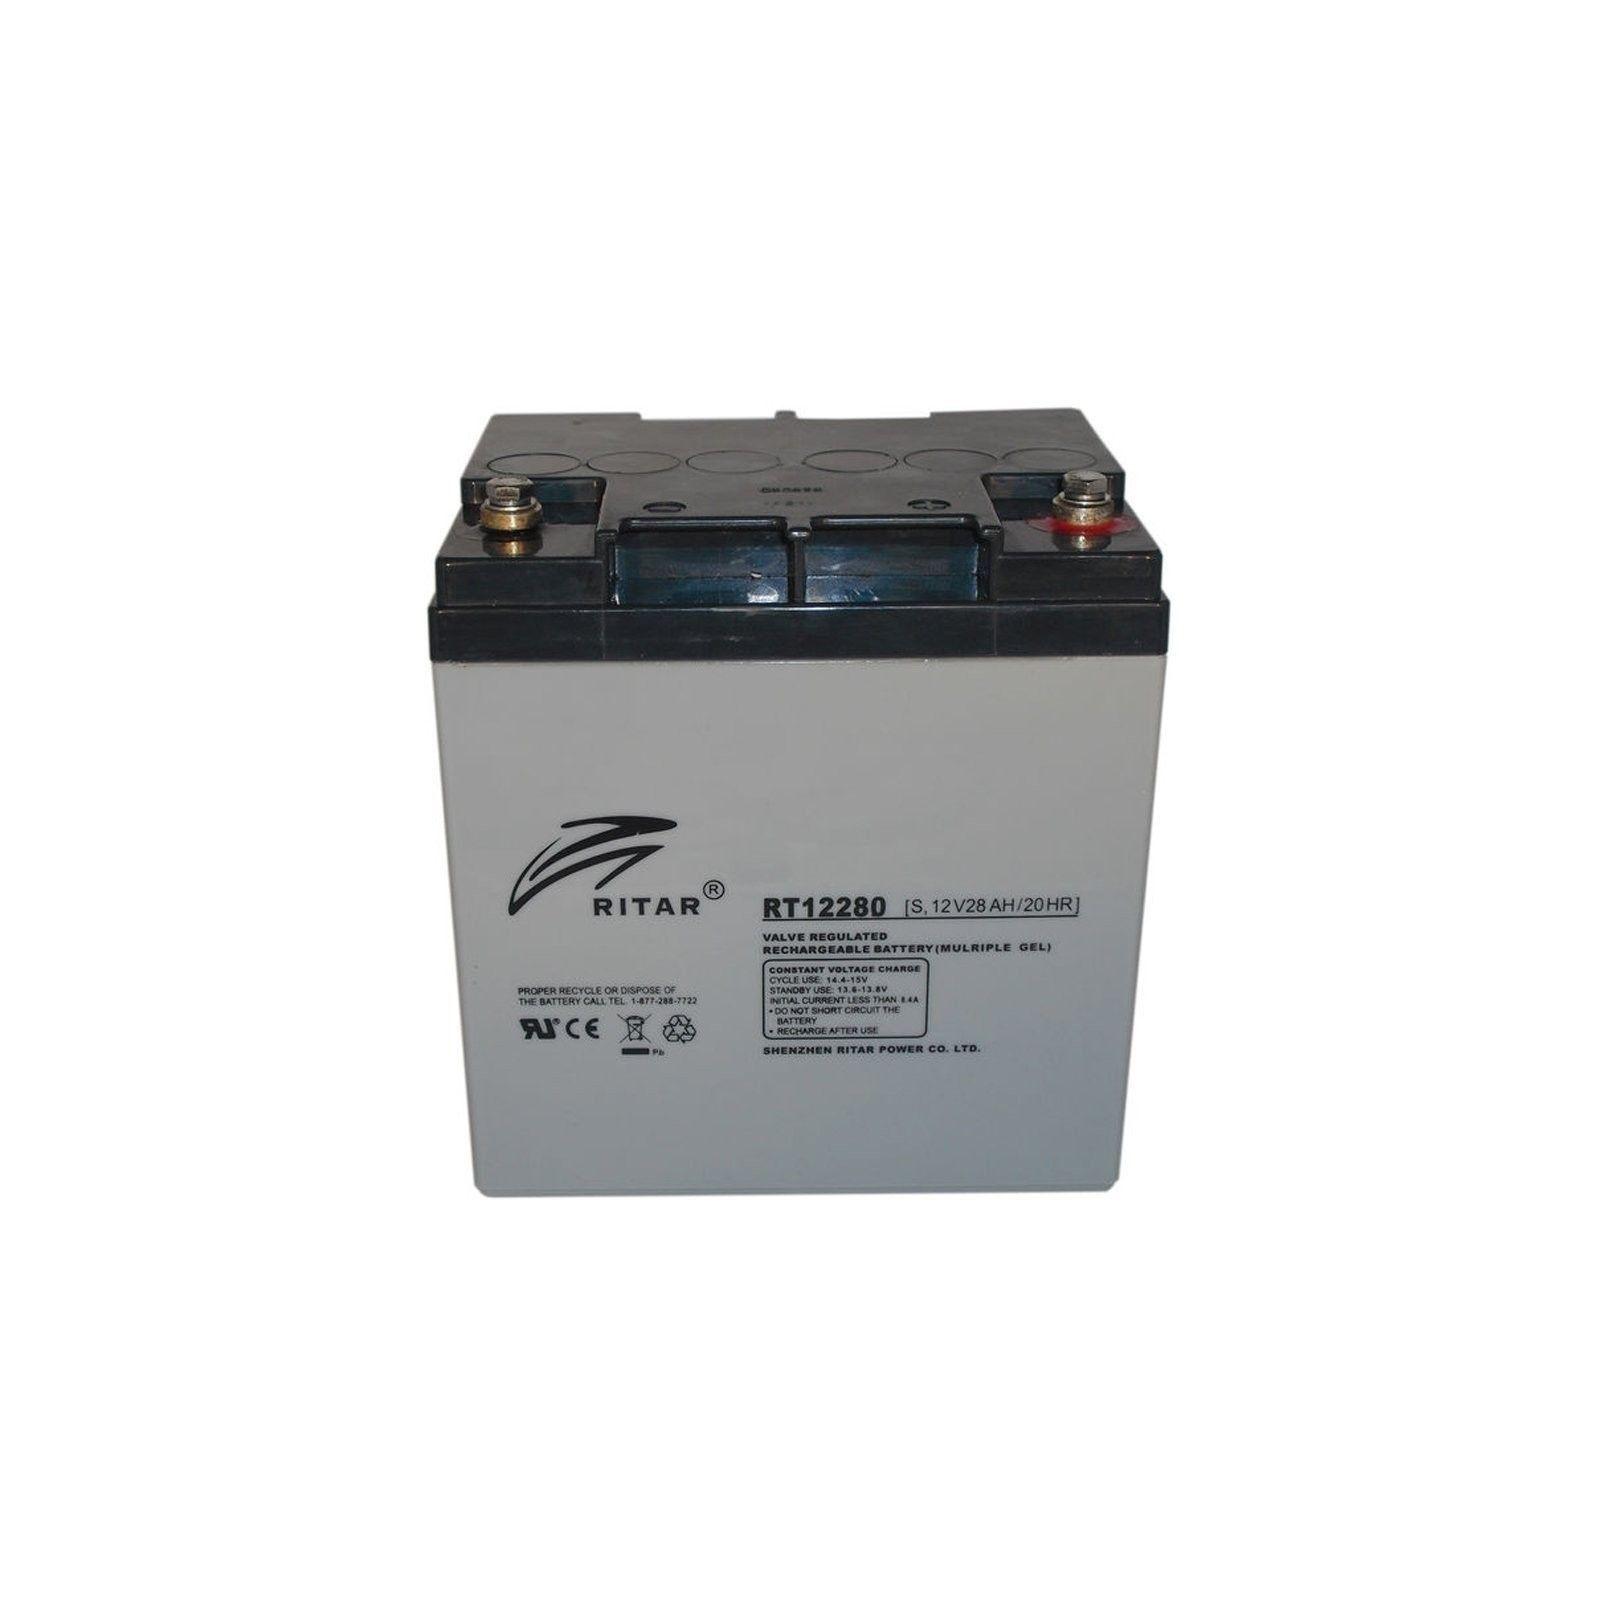 BATERIA MK POWERED AGM ES7-12 12V 7,2AH  - 1